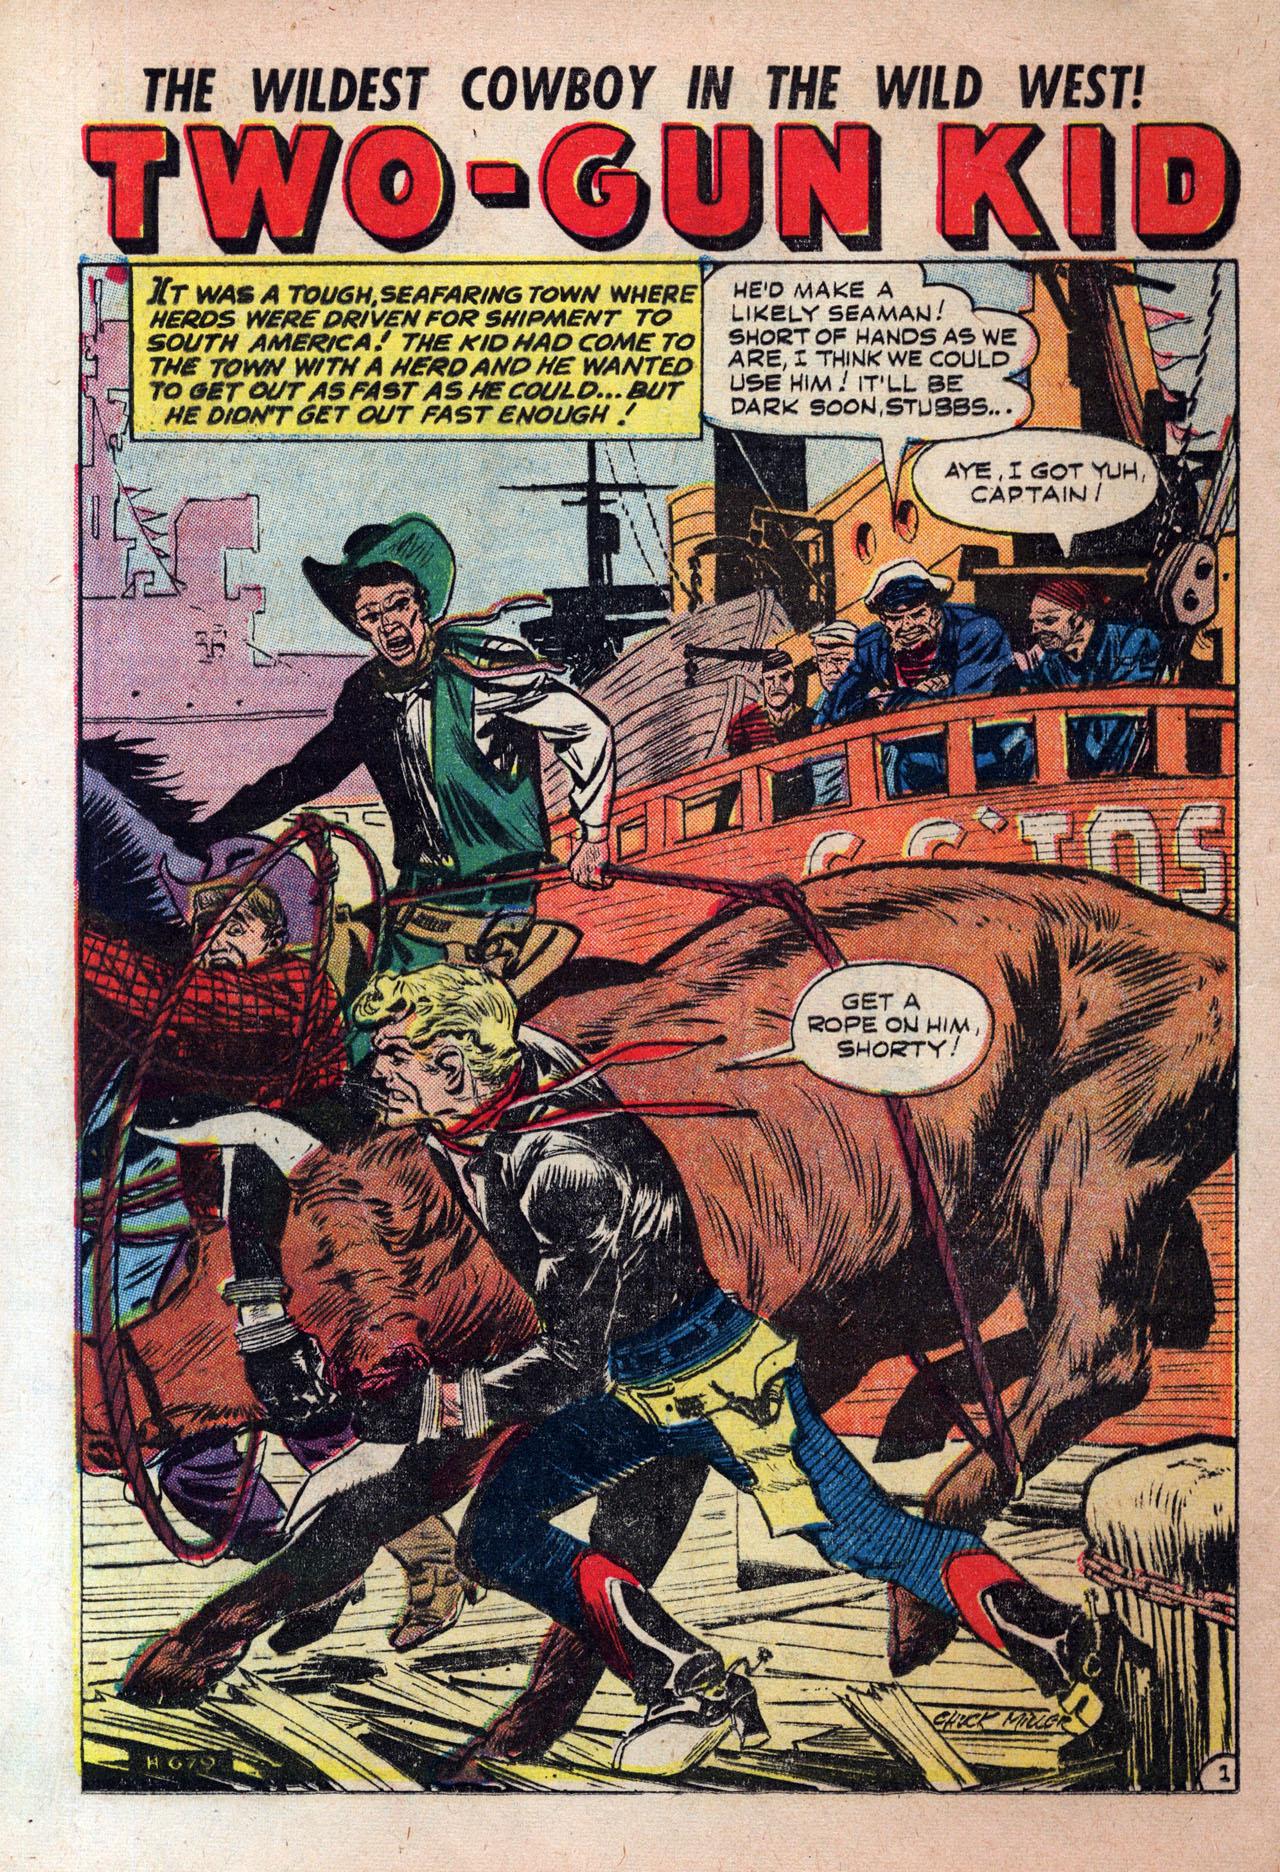 Read online Two-Gun Kid comic -  Issue #30 - 16